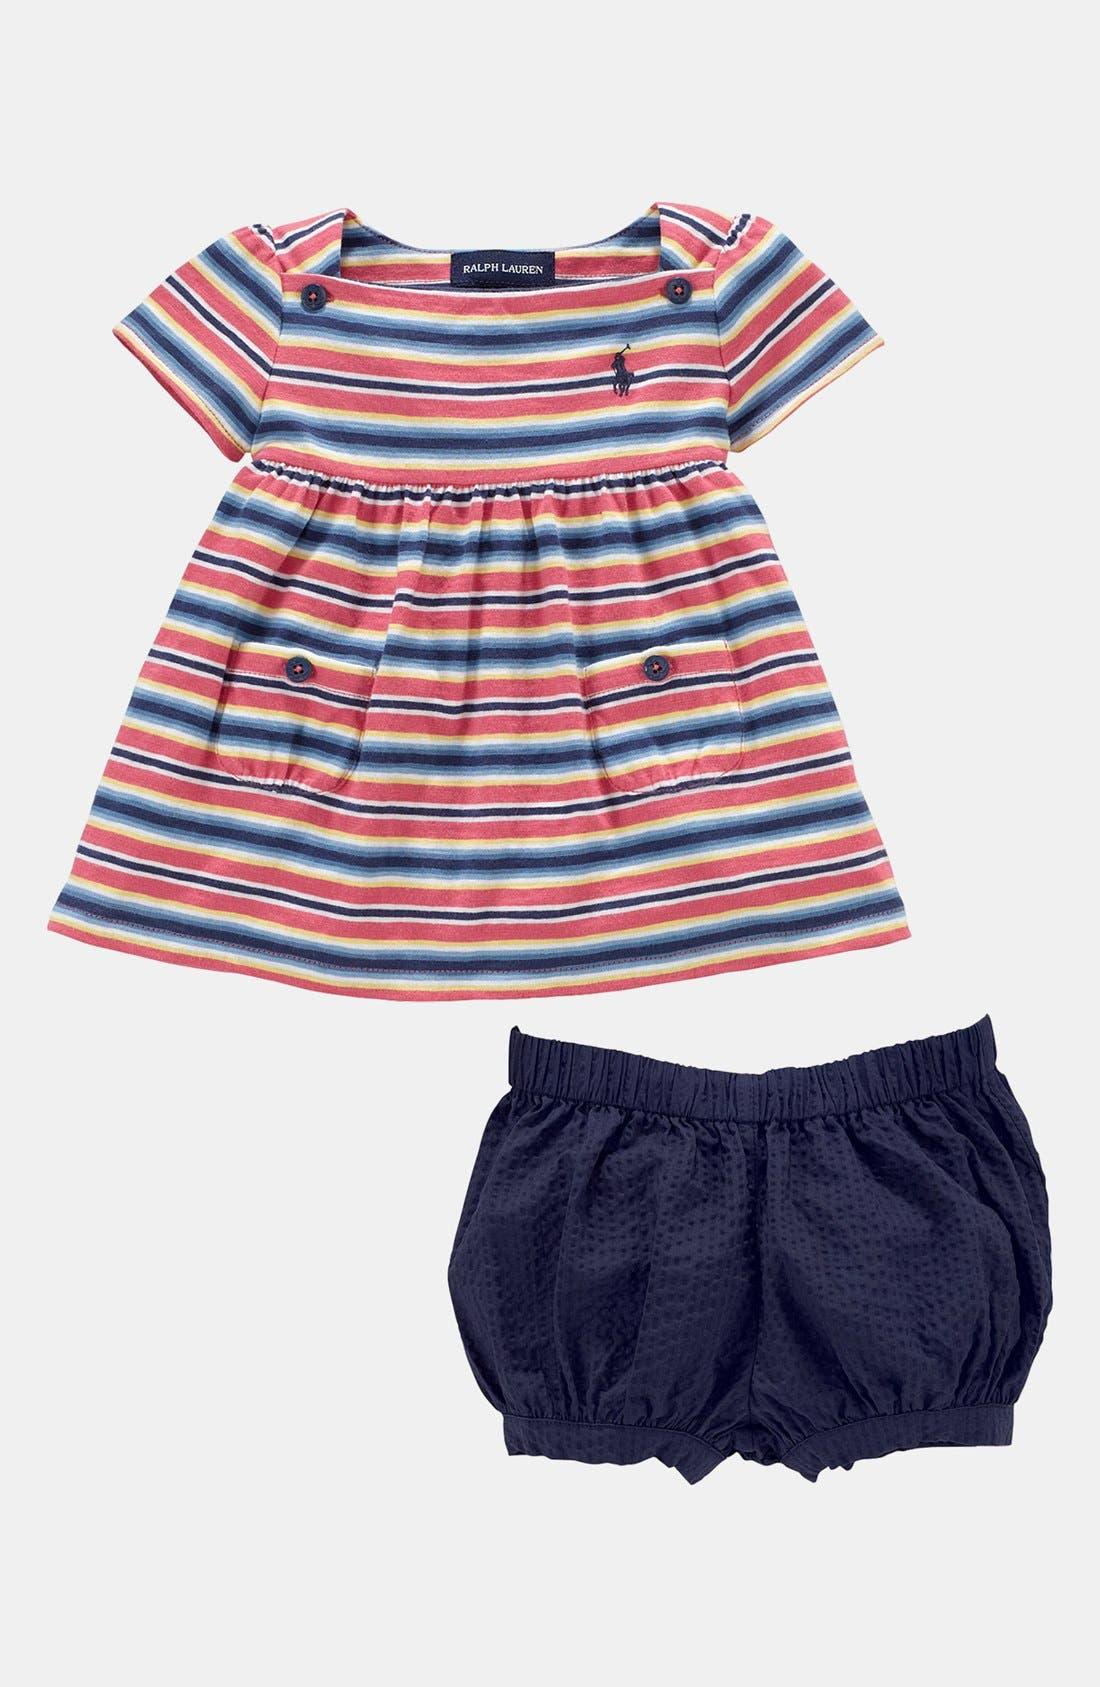 Alternate Image 2  - Ralph Lauren Top & Shorts (Baby Girls)